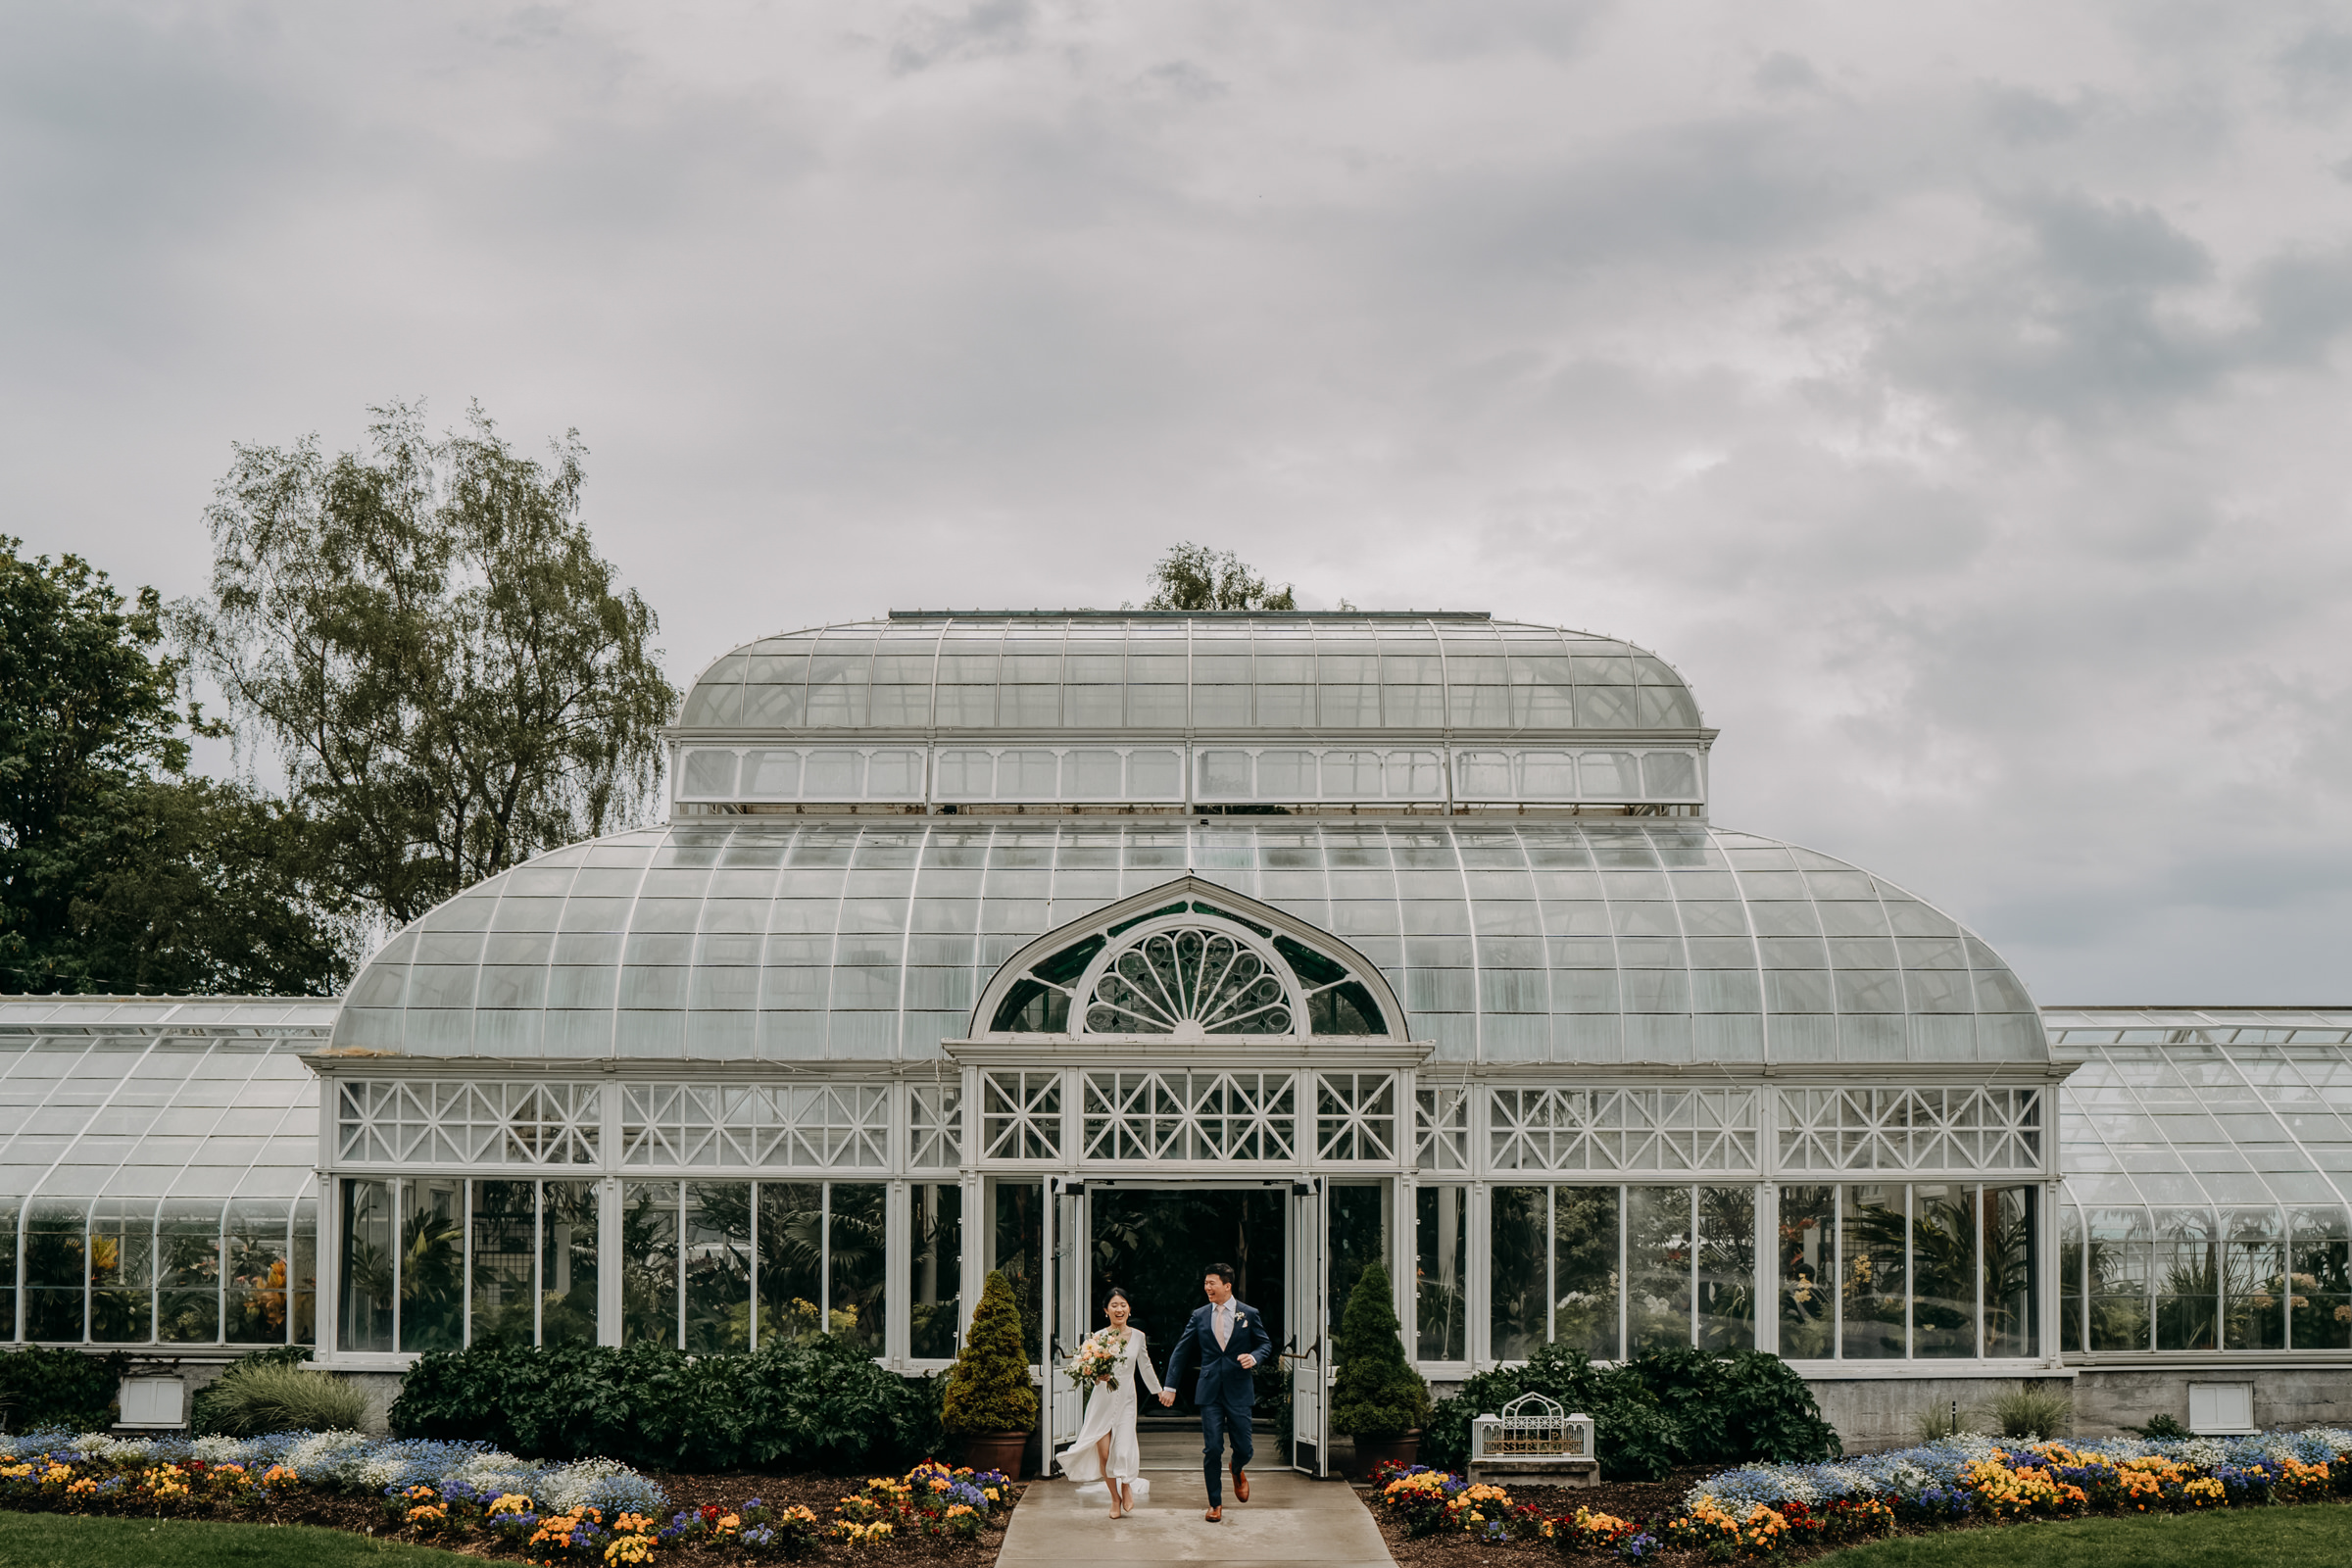 bride-and-groom-at-Volunteer-Park-conservatory-seattle0wa-sasha-reiko